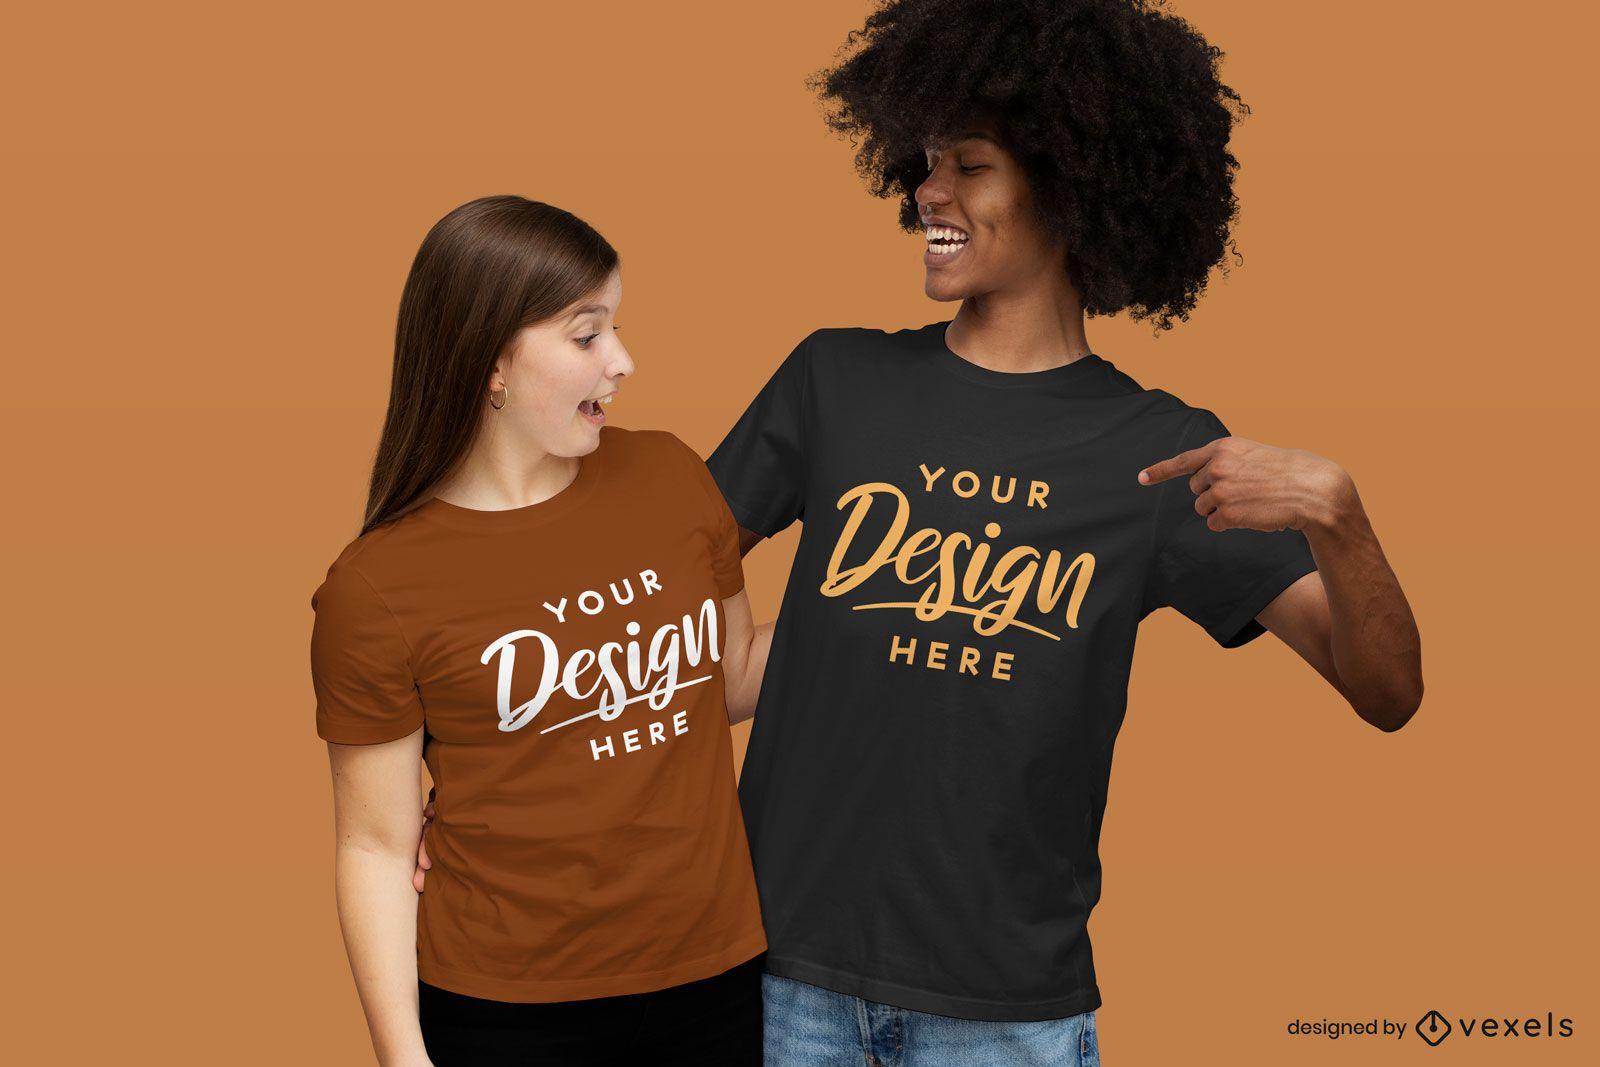 Couple smiling t-shirt mockup